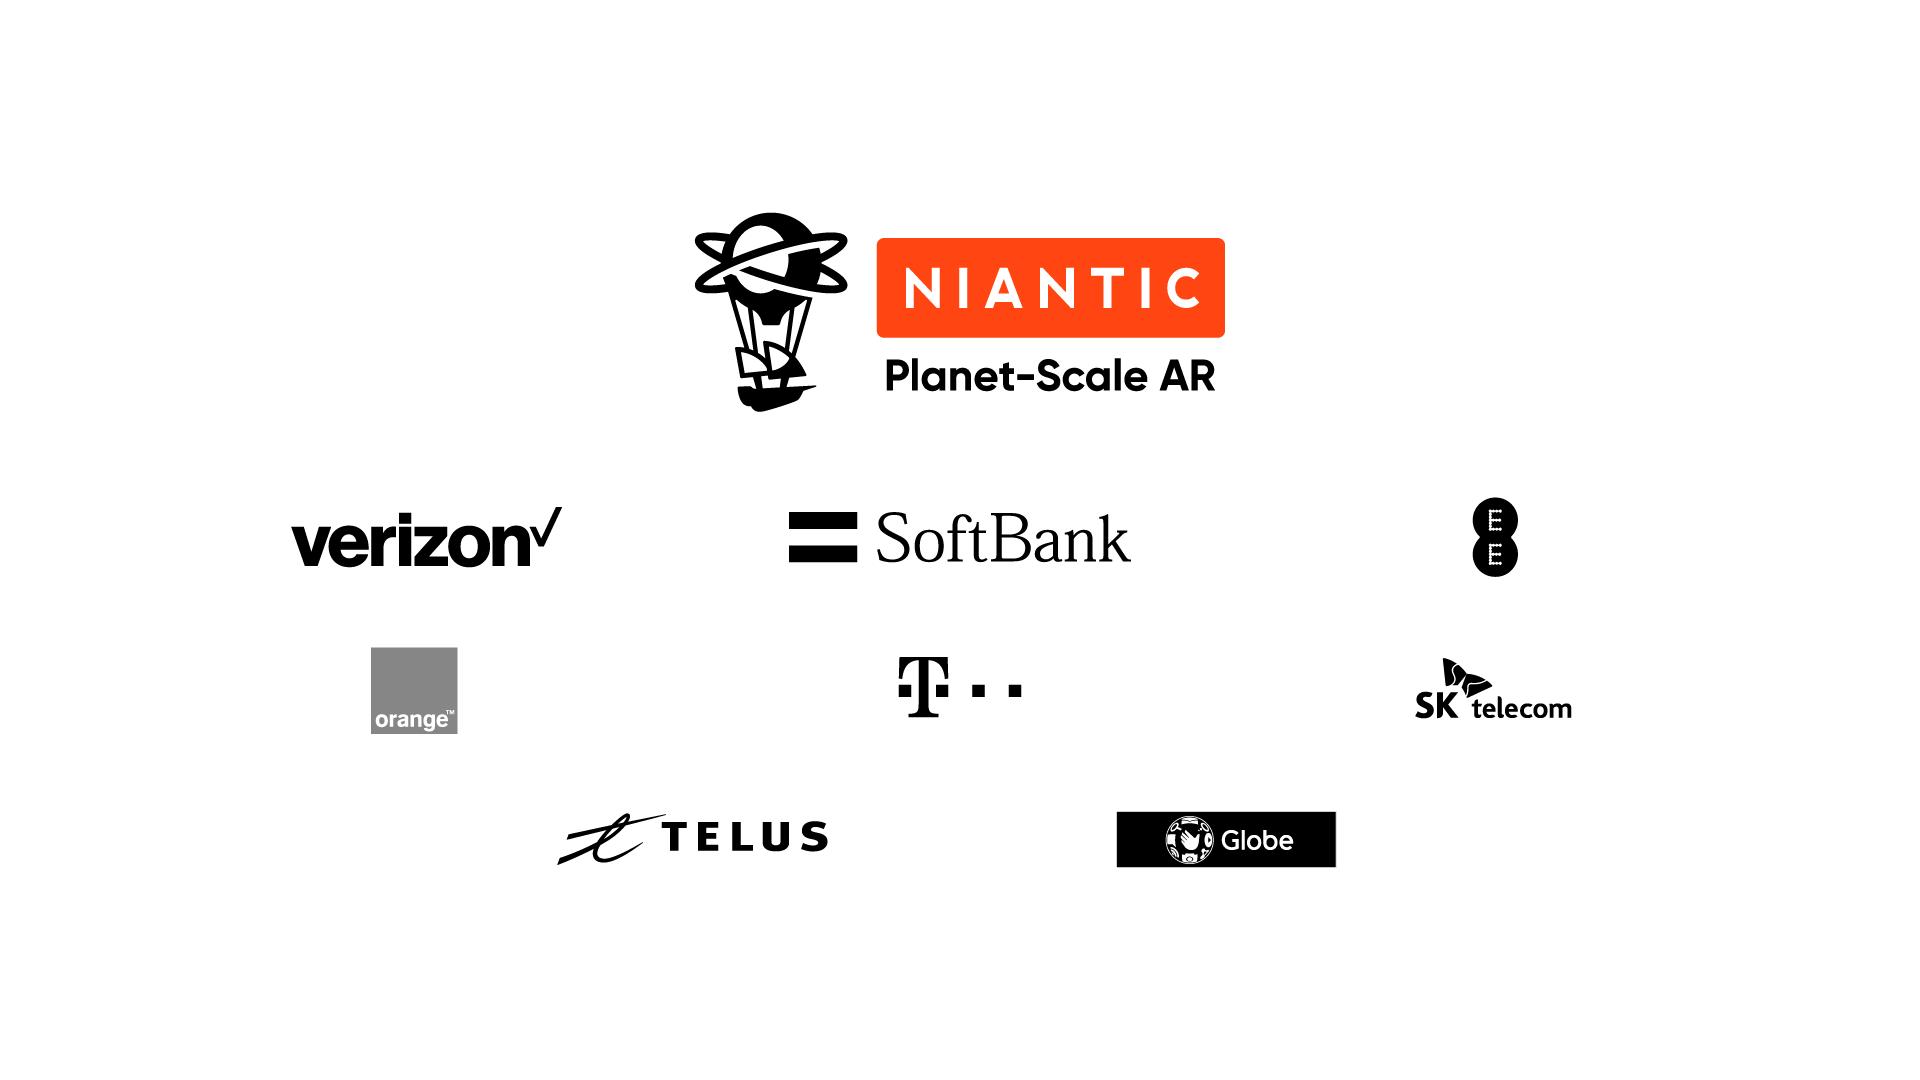 Niantic Planet Scale AR alliance